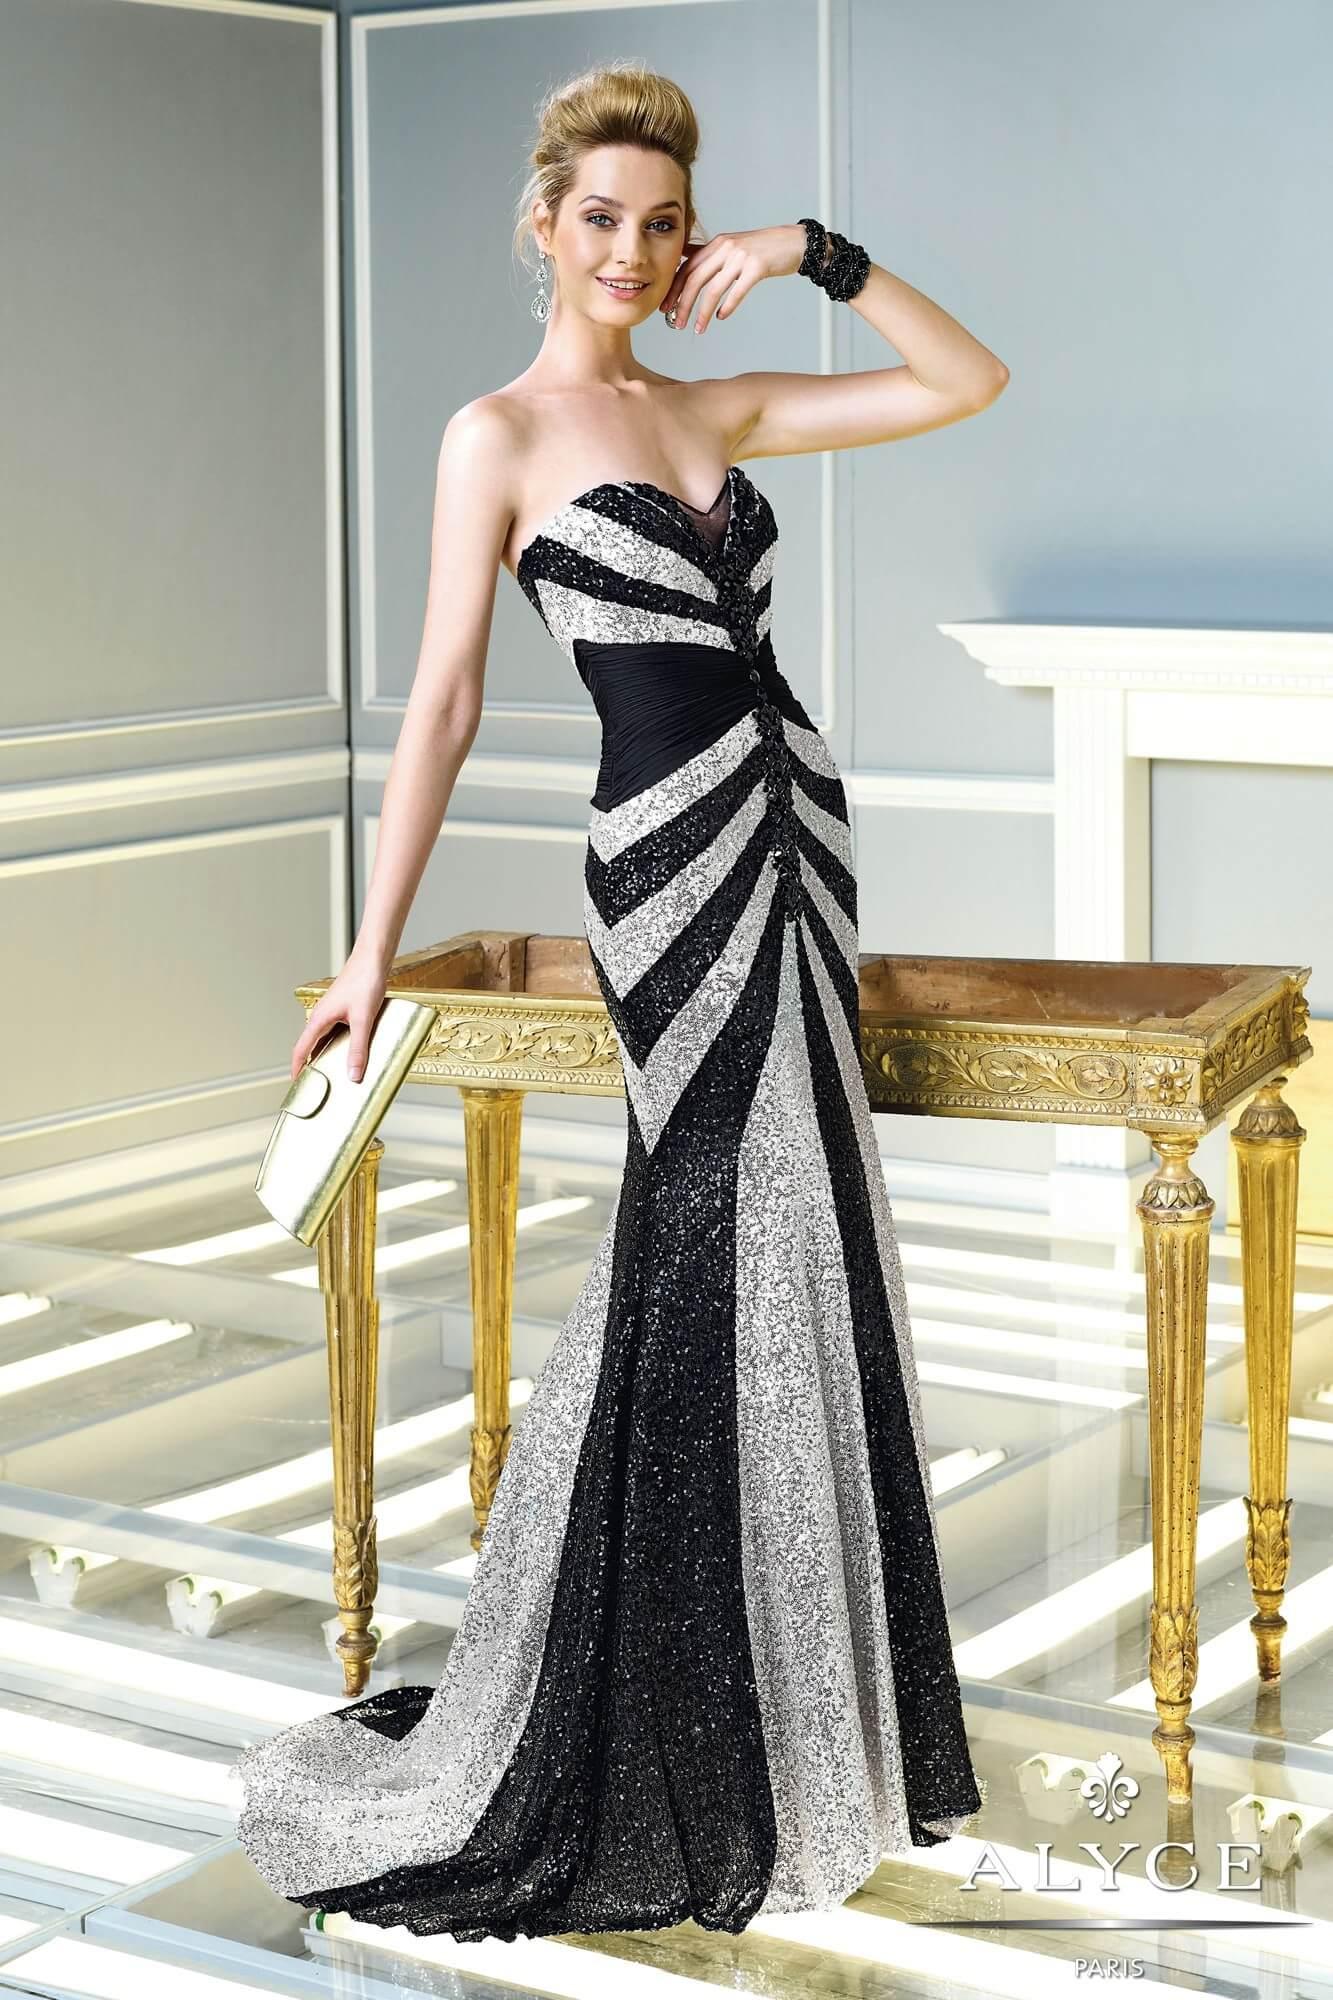 dolga_maturantska_obleka_z_blescicami_elegantna_morska_deklica_svecana